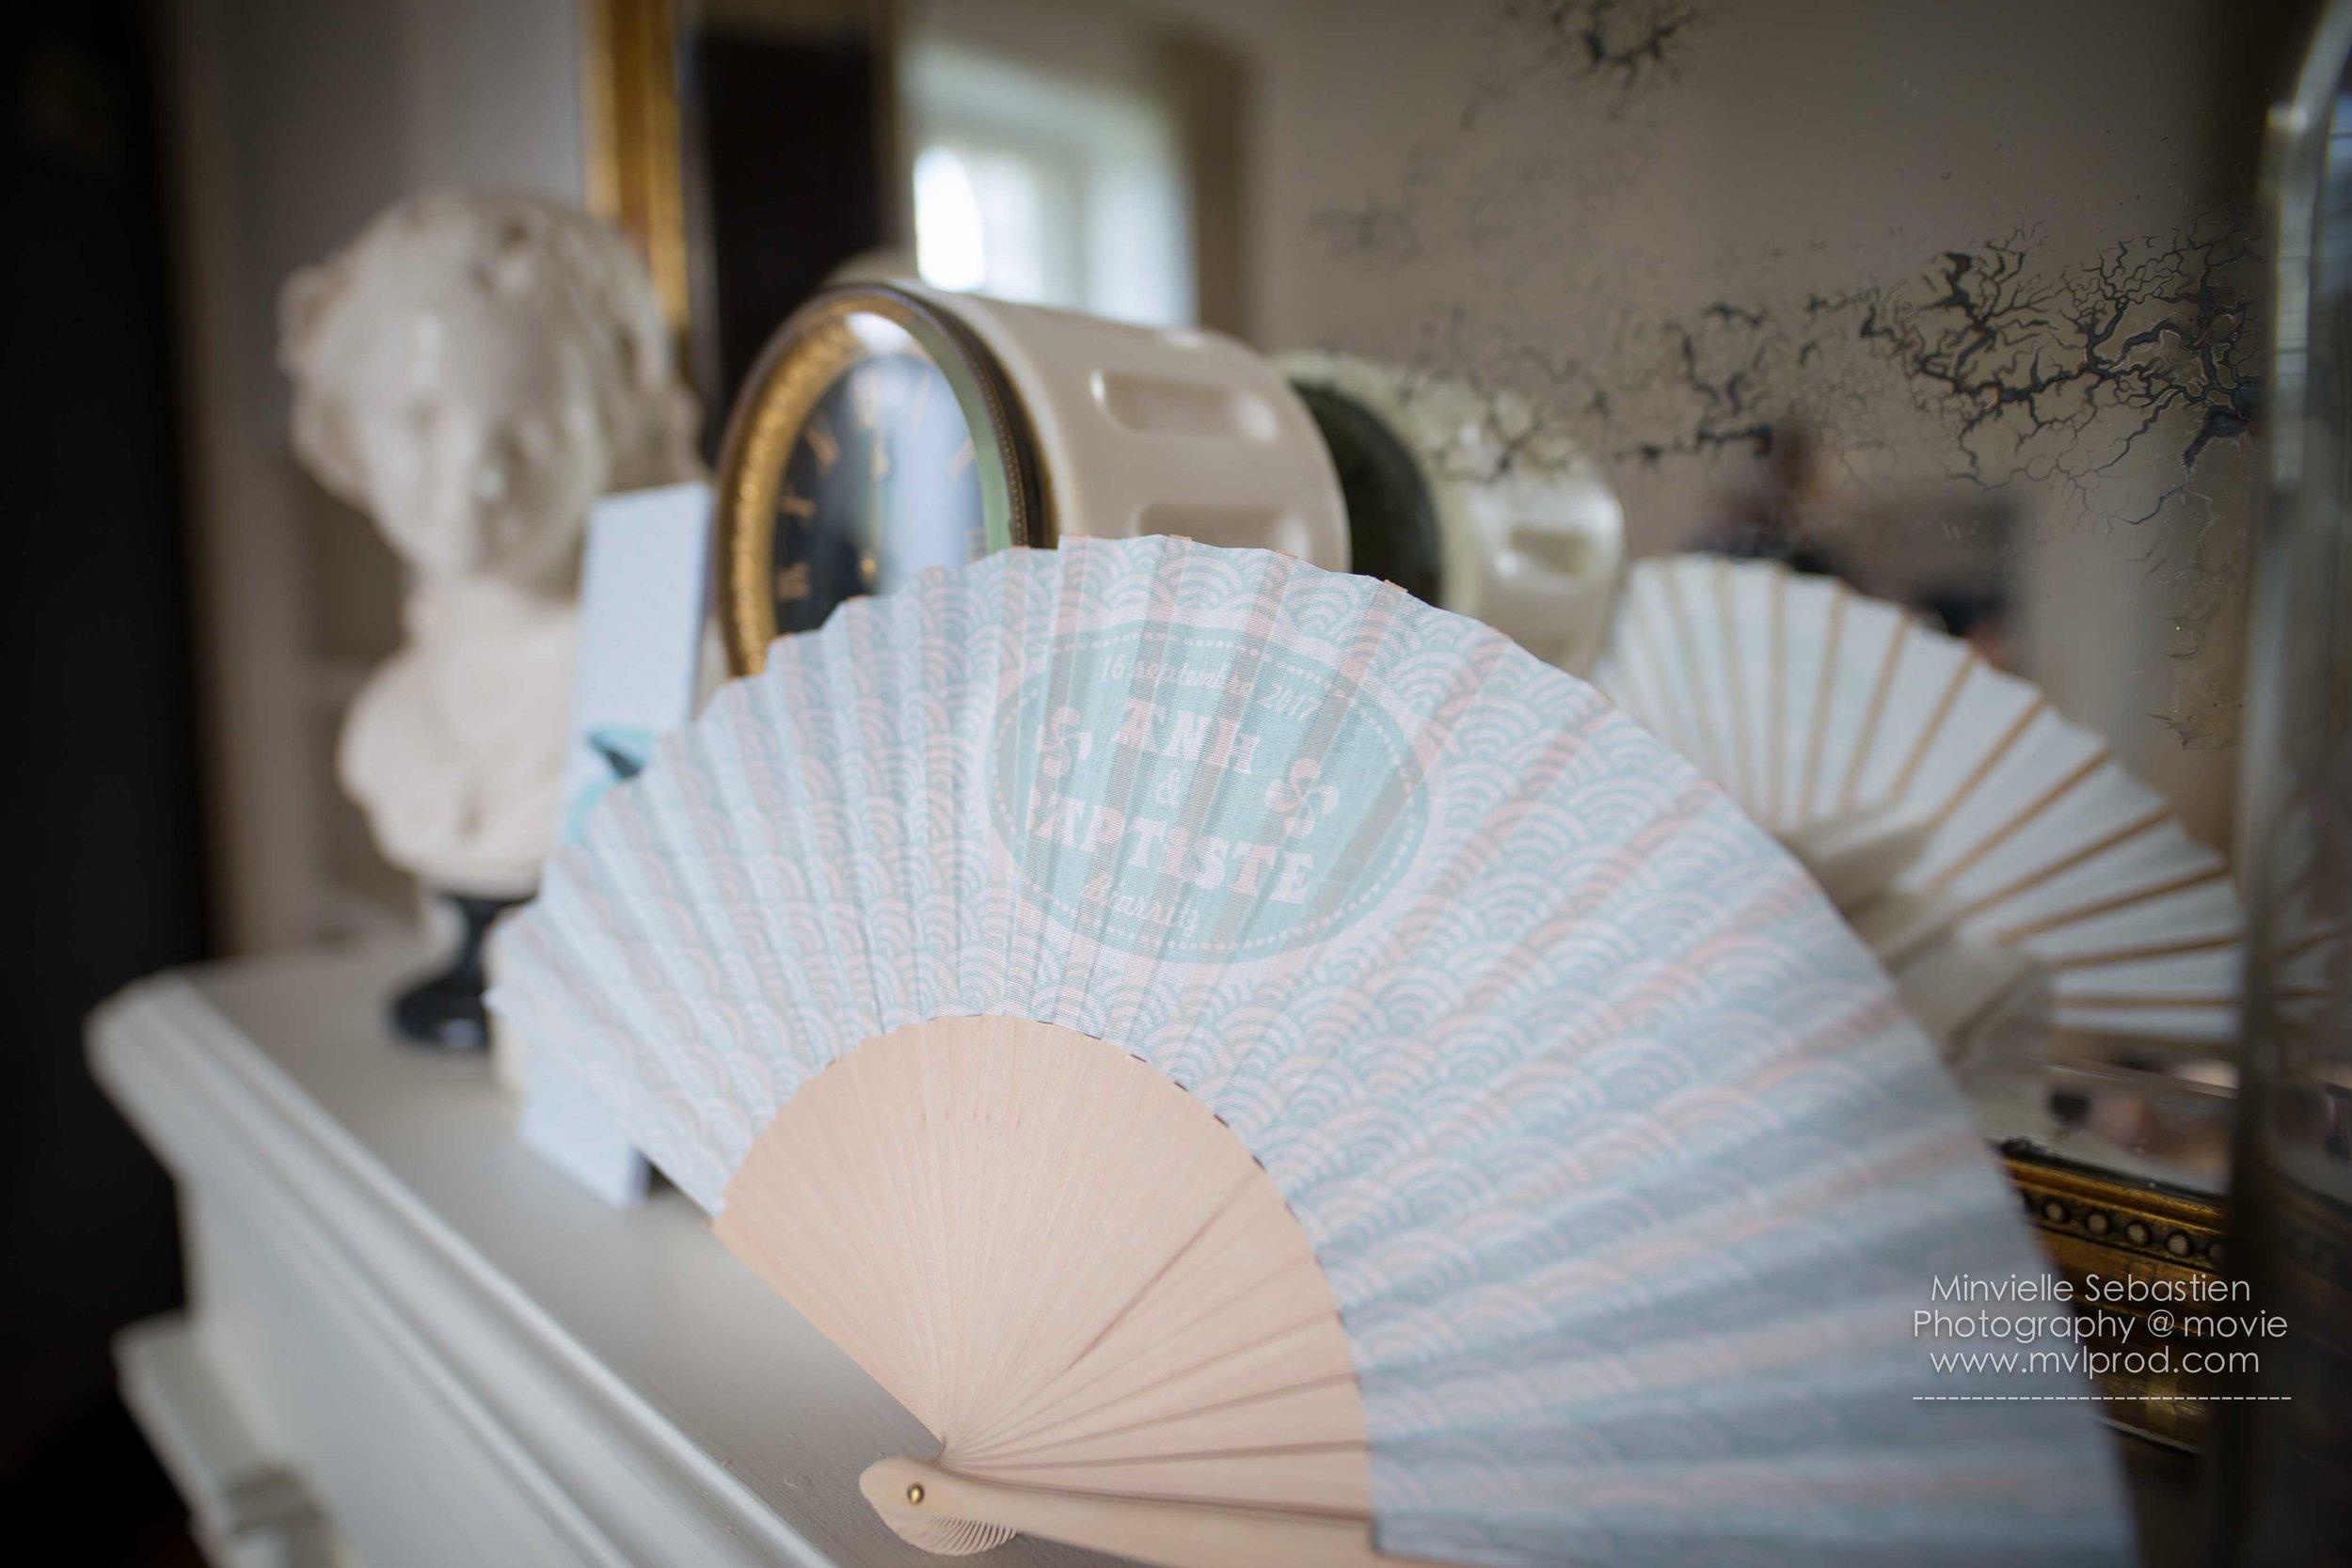 decoration-mariage-decoration-mariageIMG_3003.jpg